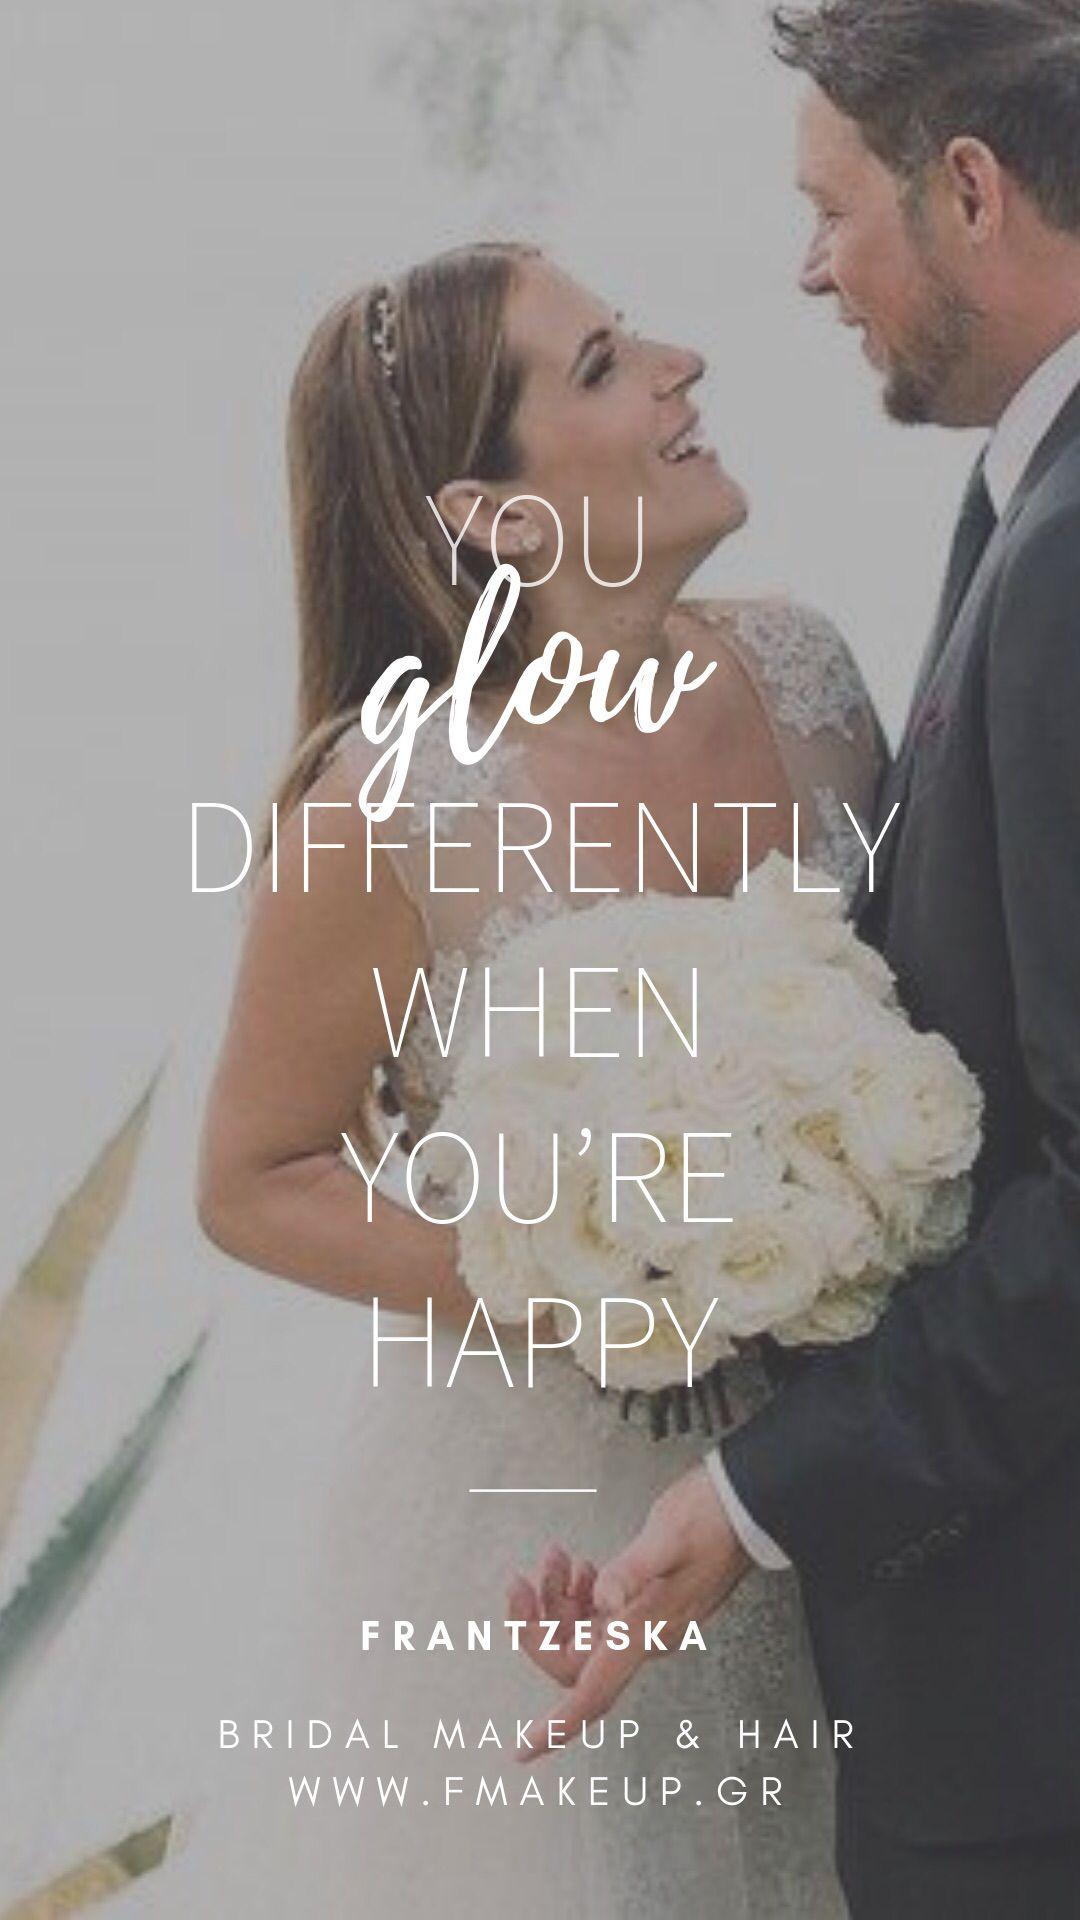 quote, love, happy, groom, bride, bridal, makeup, makeup